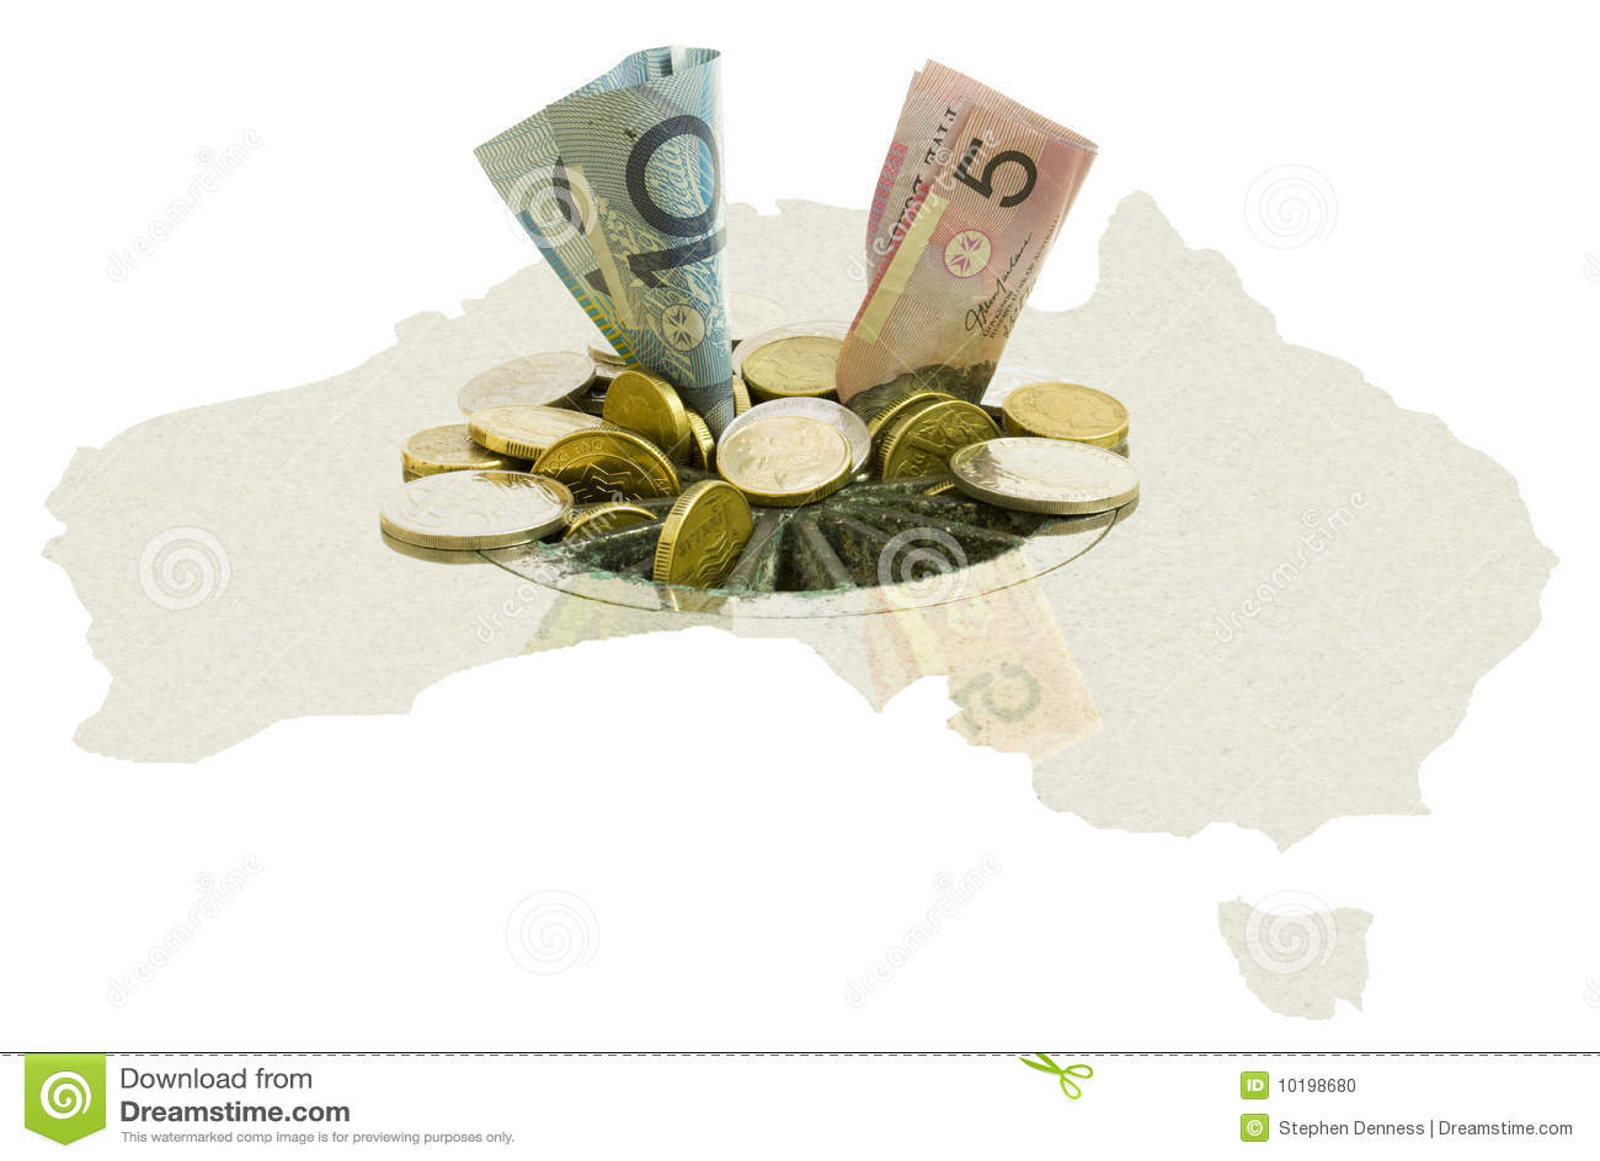 Australian financial crisis